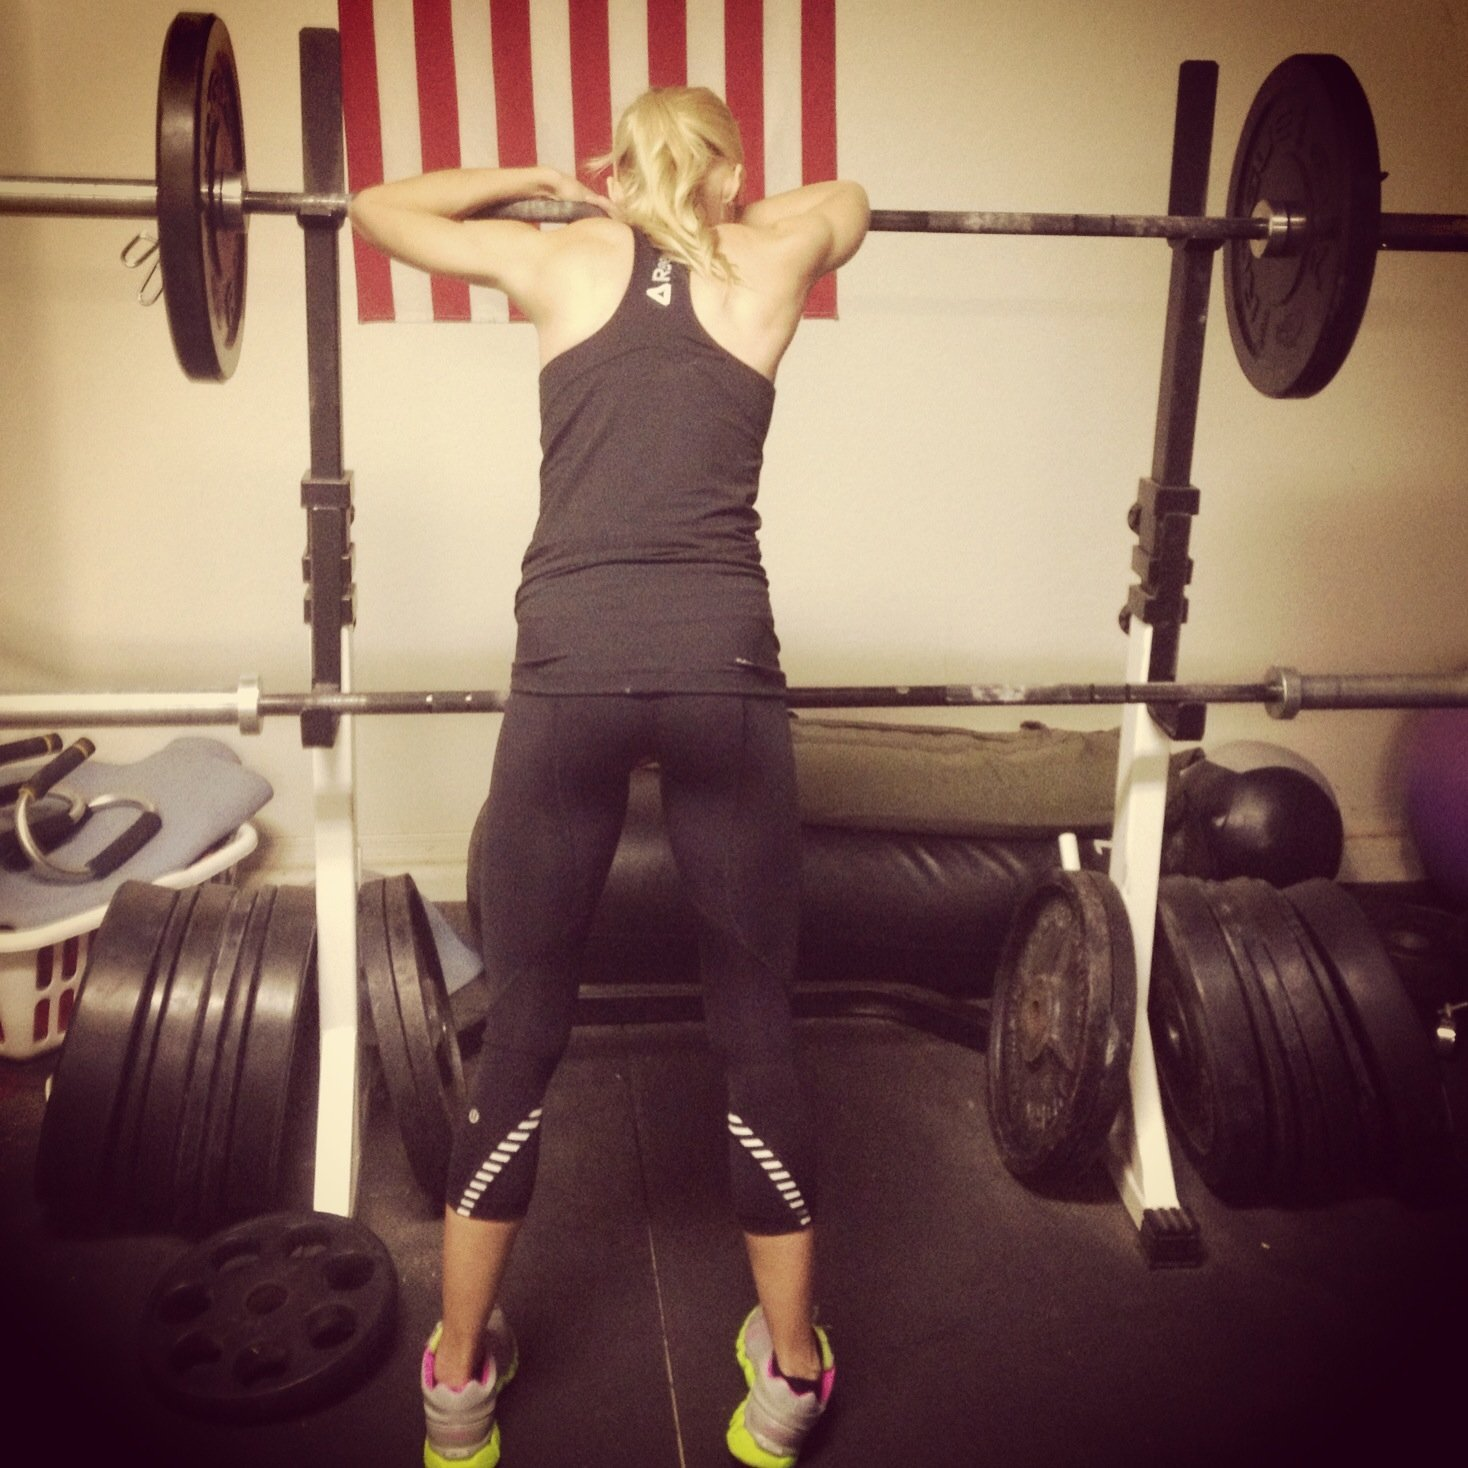 #HeidiPowell #Lululemon #WorkoutClothes